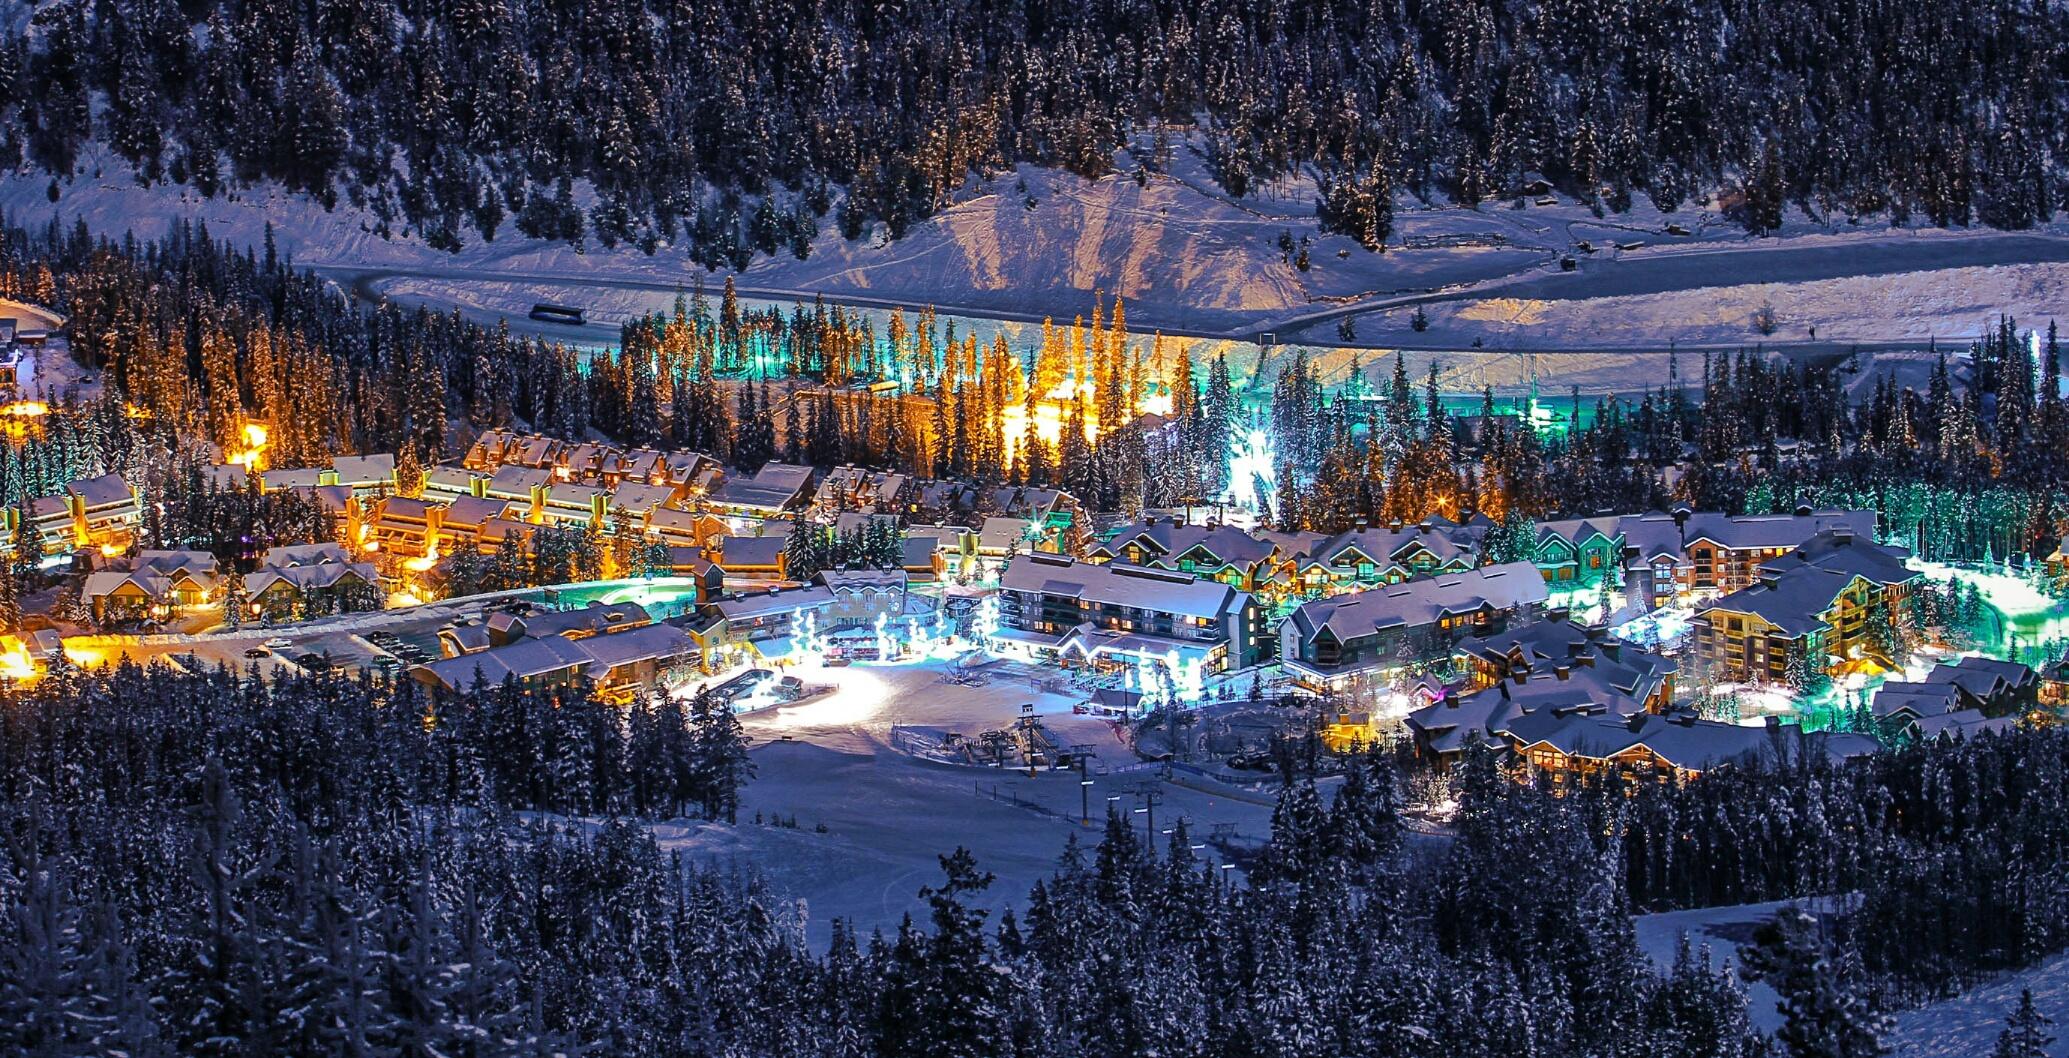 panorama mountain resort - british columbia ski-in / ski-out destination